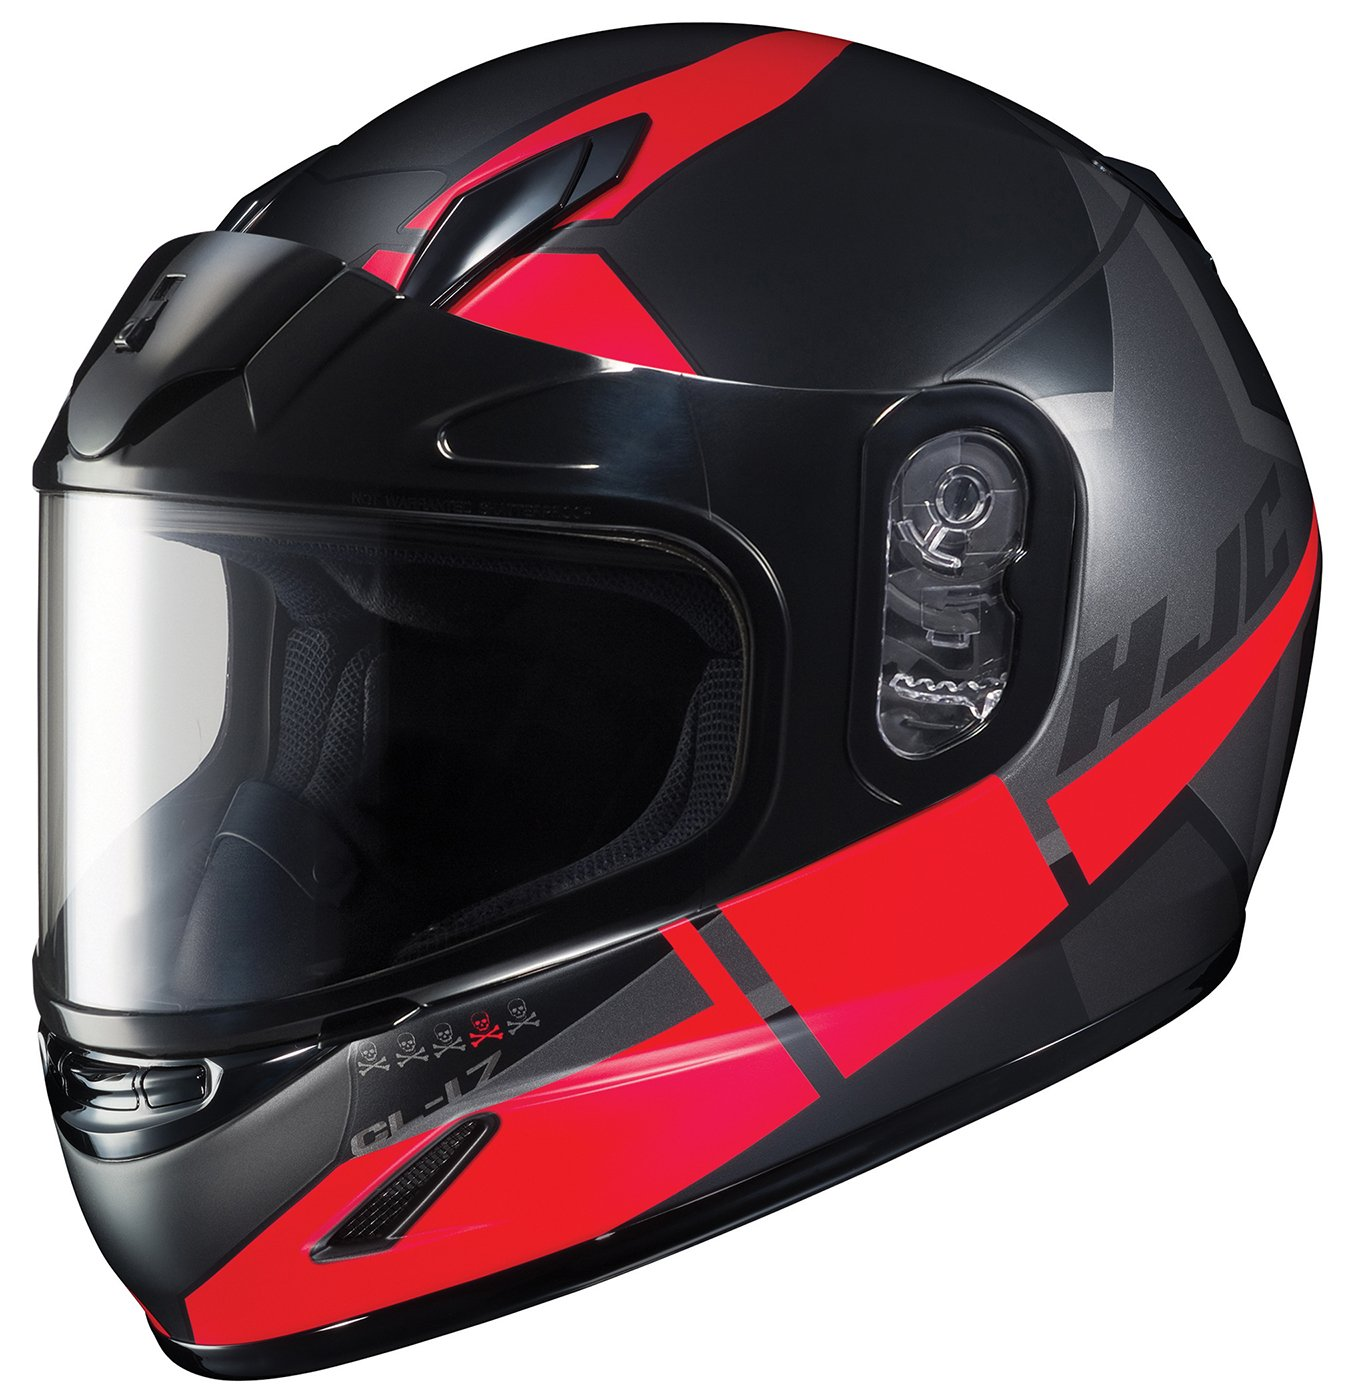 HJC Helmets Unisex-Child Full-face-Helmet-Style CL-YSN Boost Dual Lens MC-5SF Medium